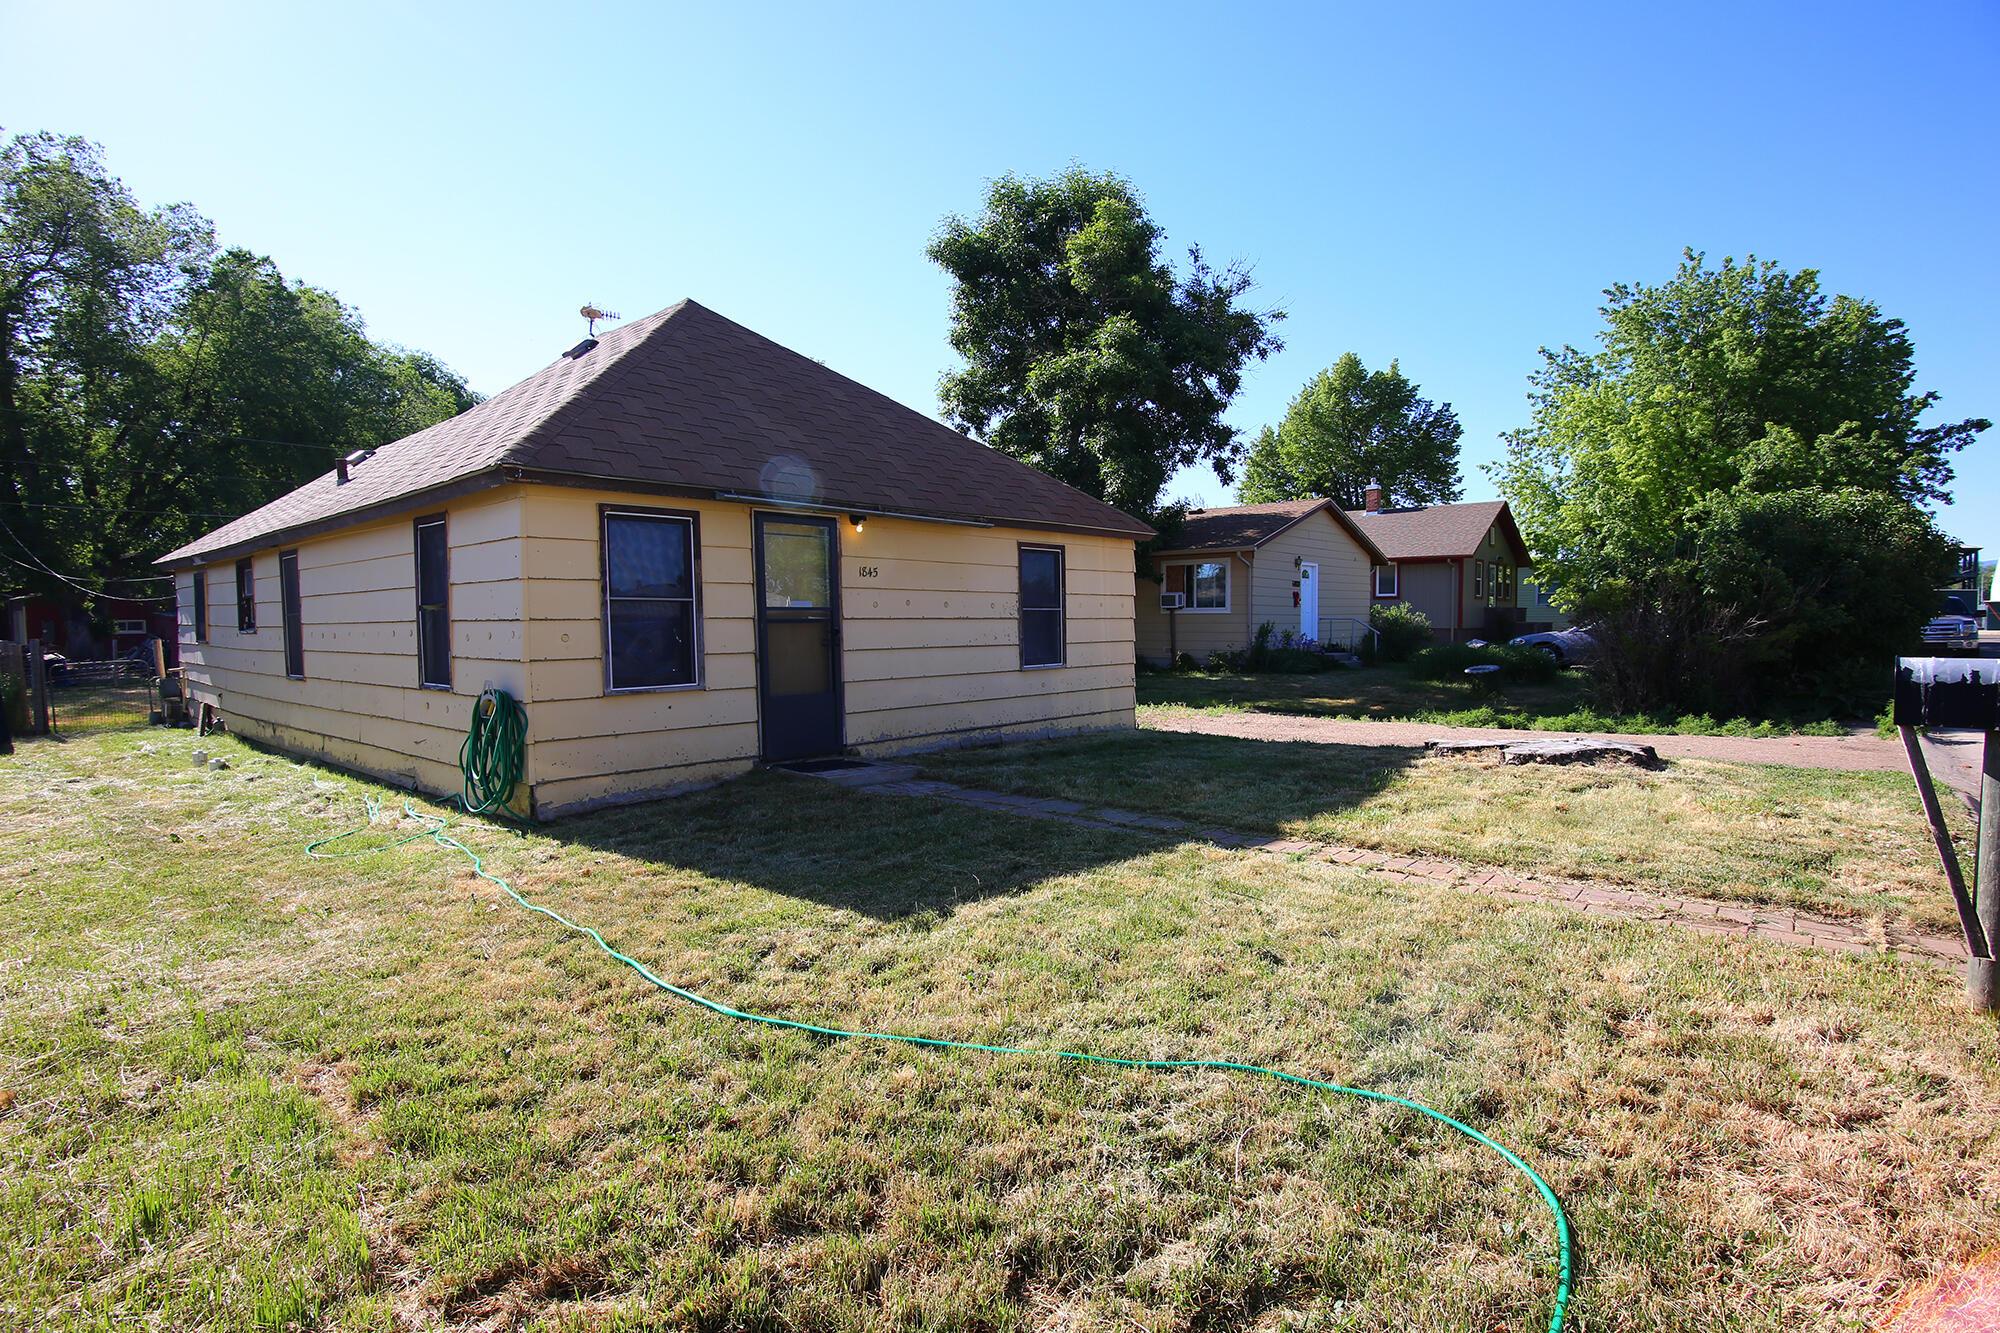 1845 Frackleton Street, Sheridan, Wyoming 82801, 2 Bedrooms Bedrooms, ,1 BathroomBathrooms,Residential,For Sale,Frackleton,21-645